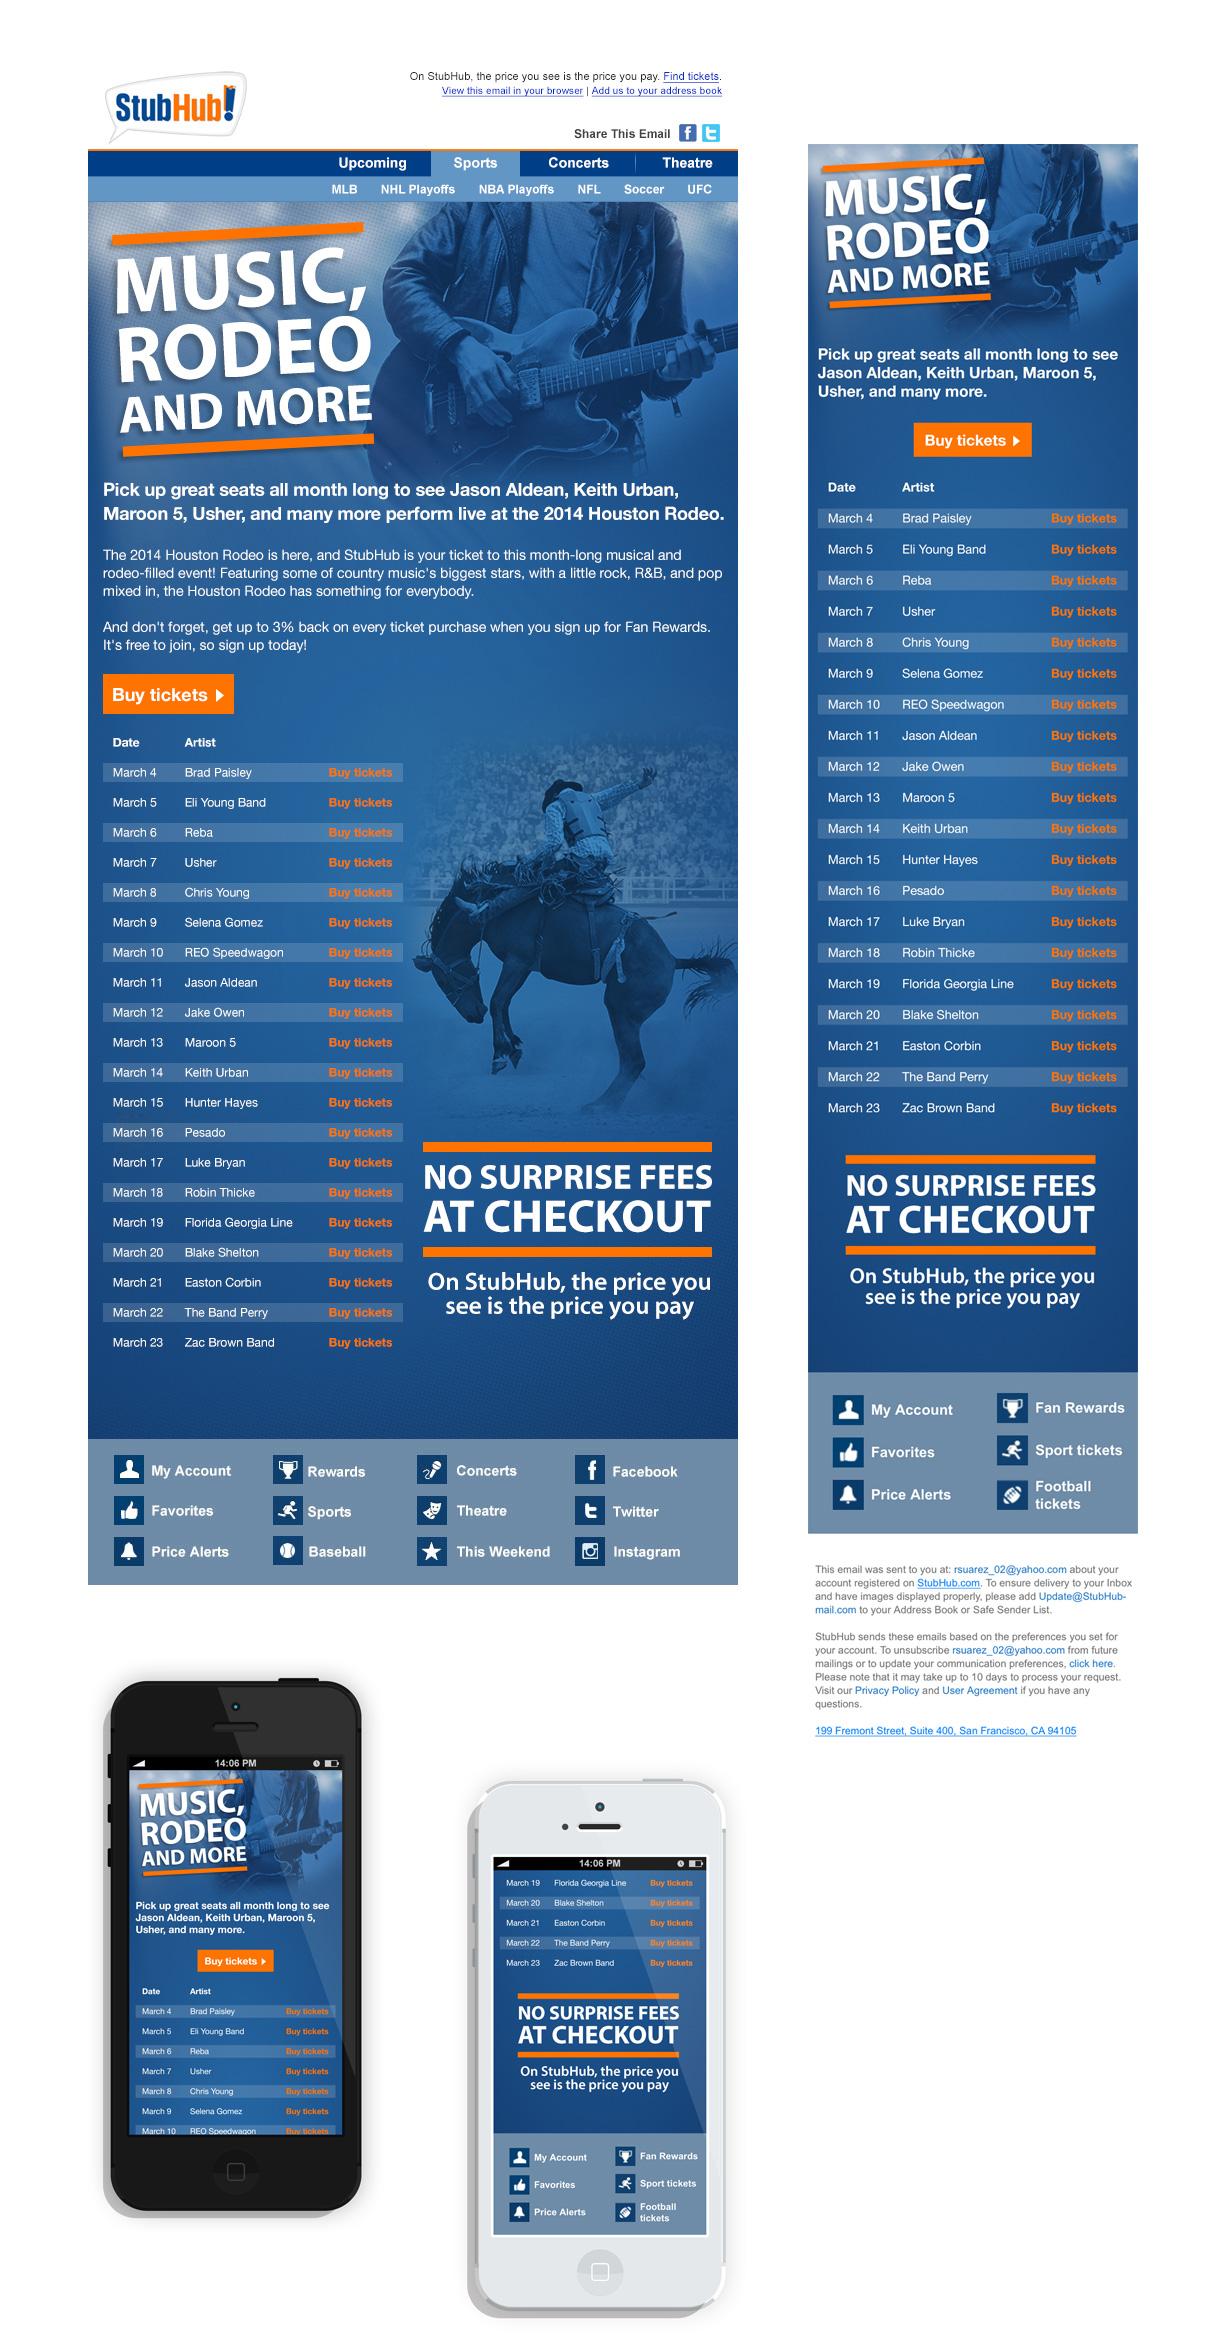 StubHub_Email_Houston_Rodeo_group.jpg